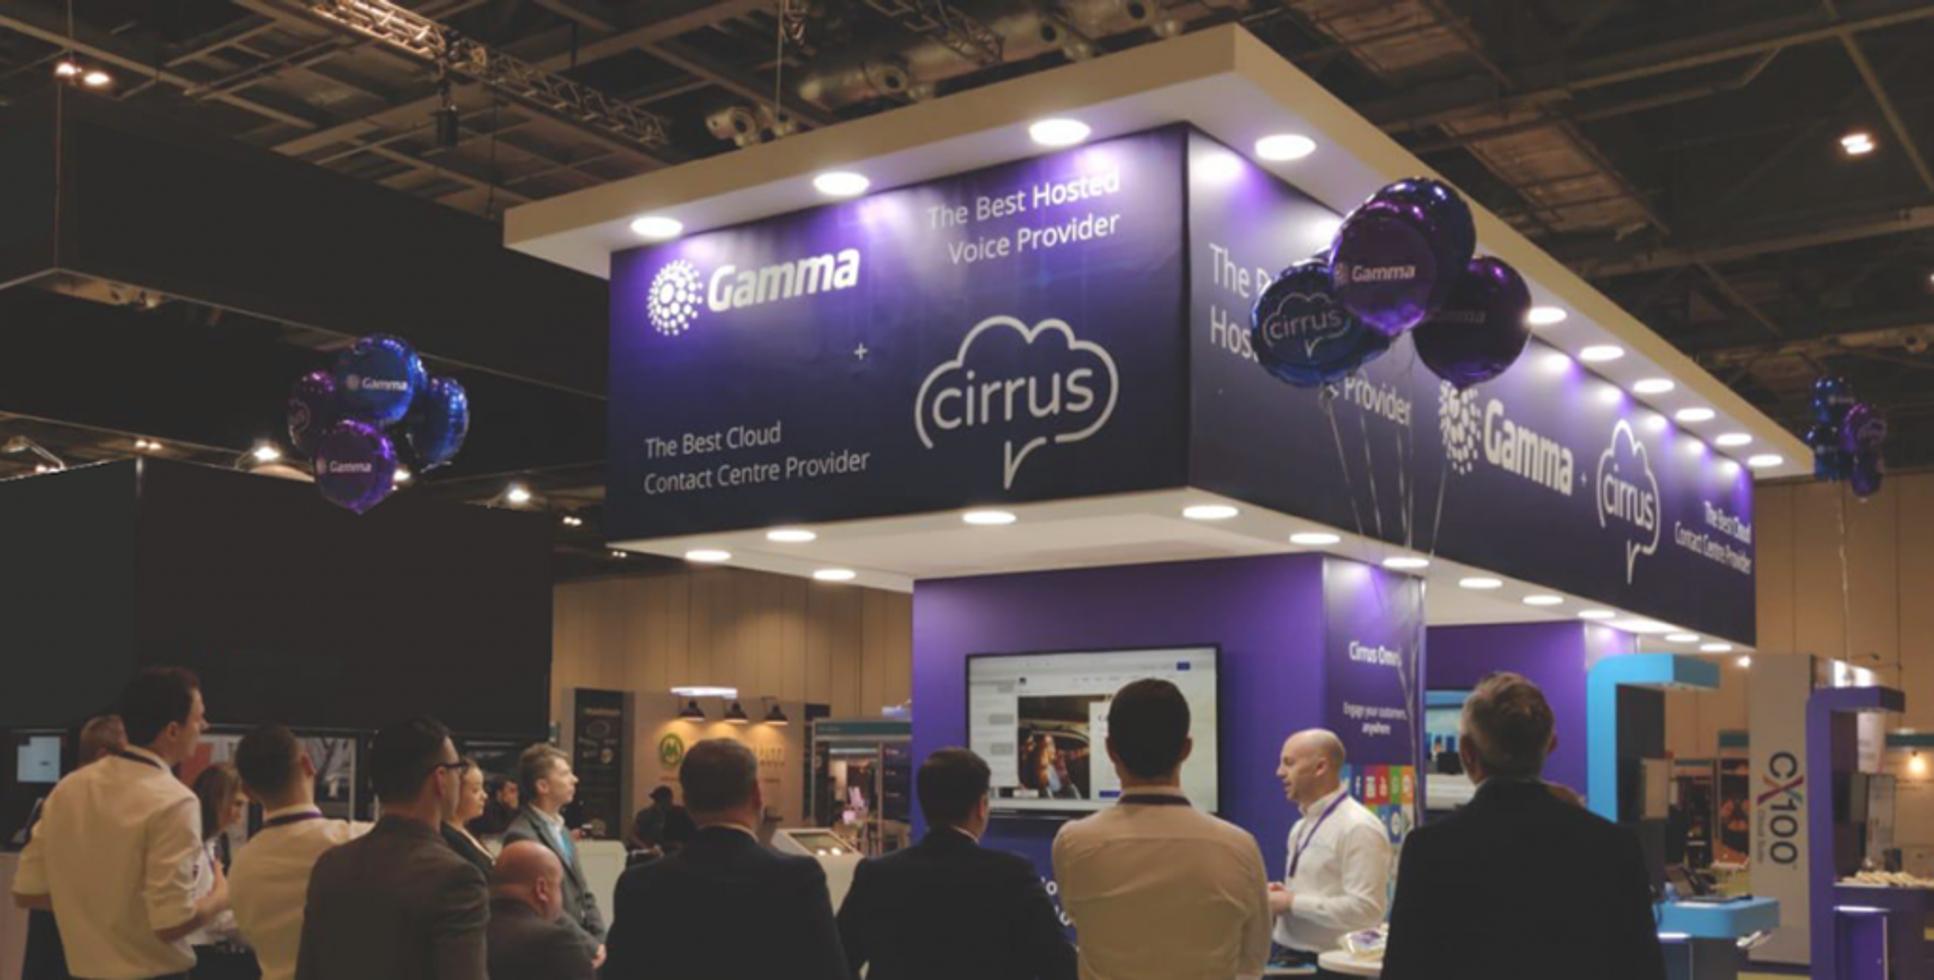 Cirrus and Gamma Partnership